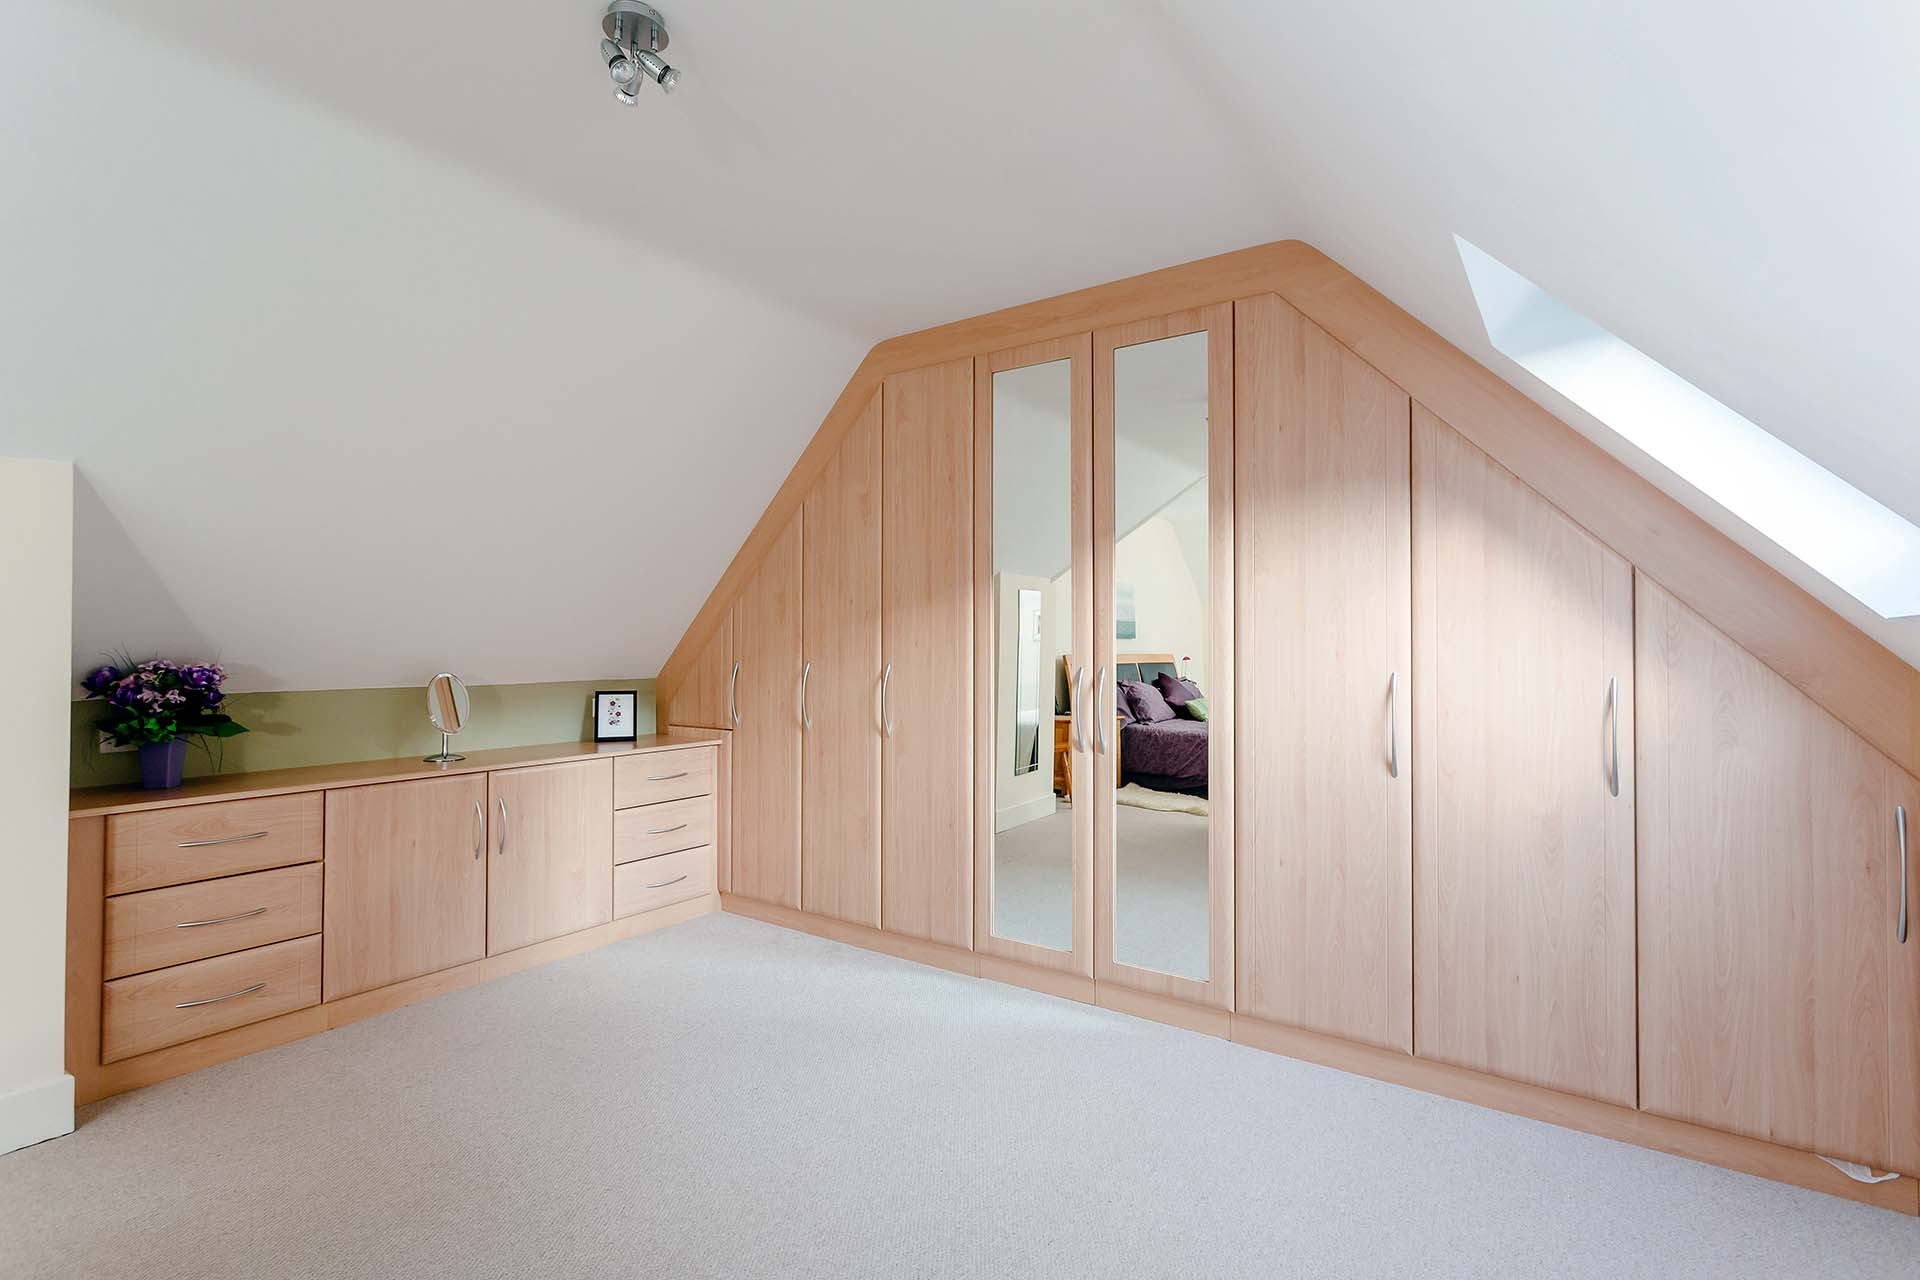 sliding versus hinged custom world bedrooms. Black Bedroom Furniture Sets. Home Design Ideas